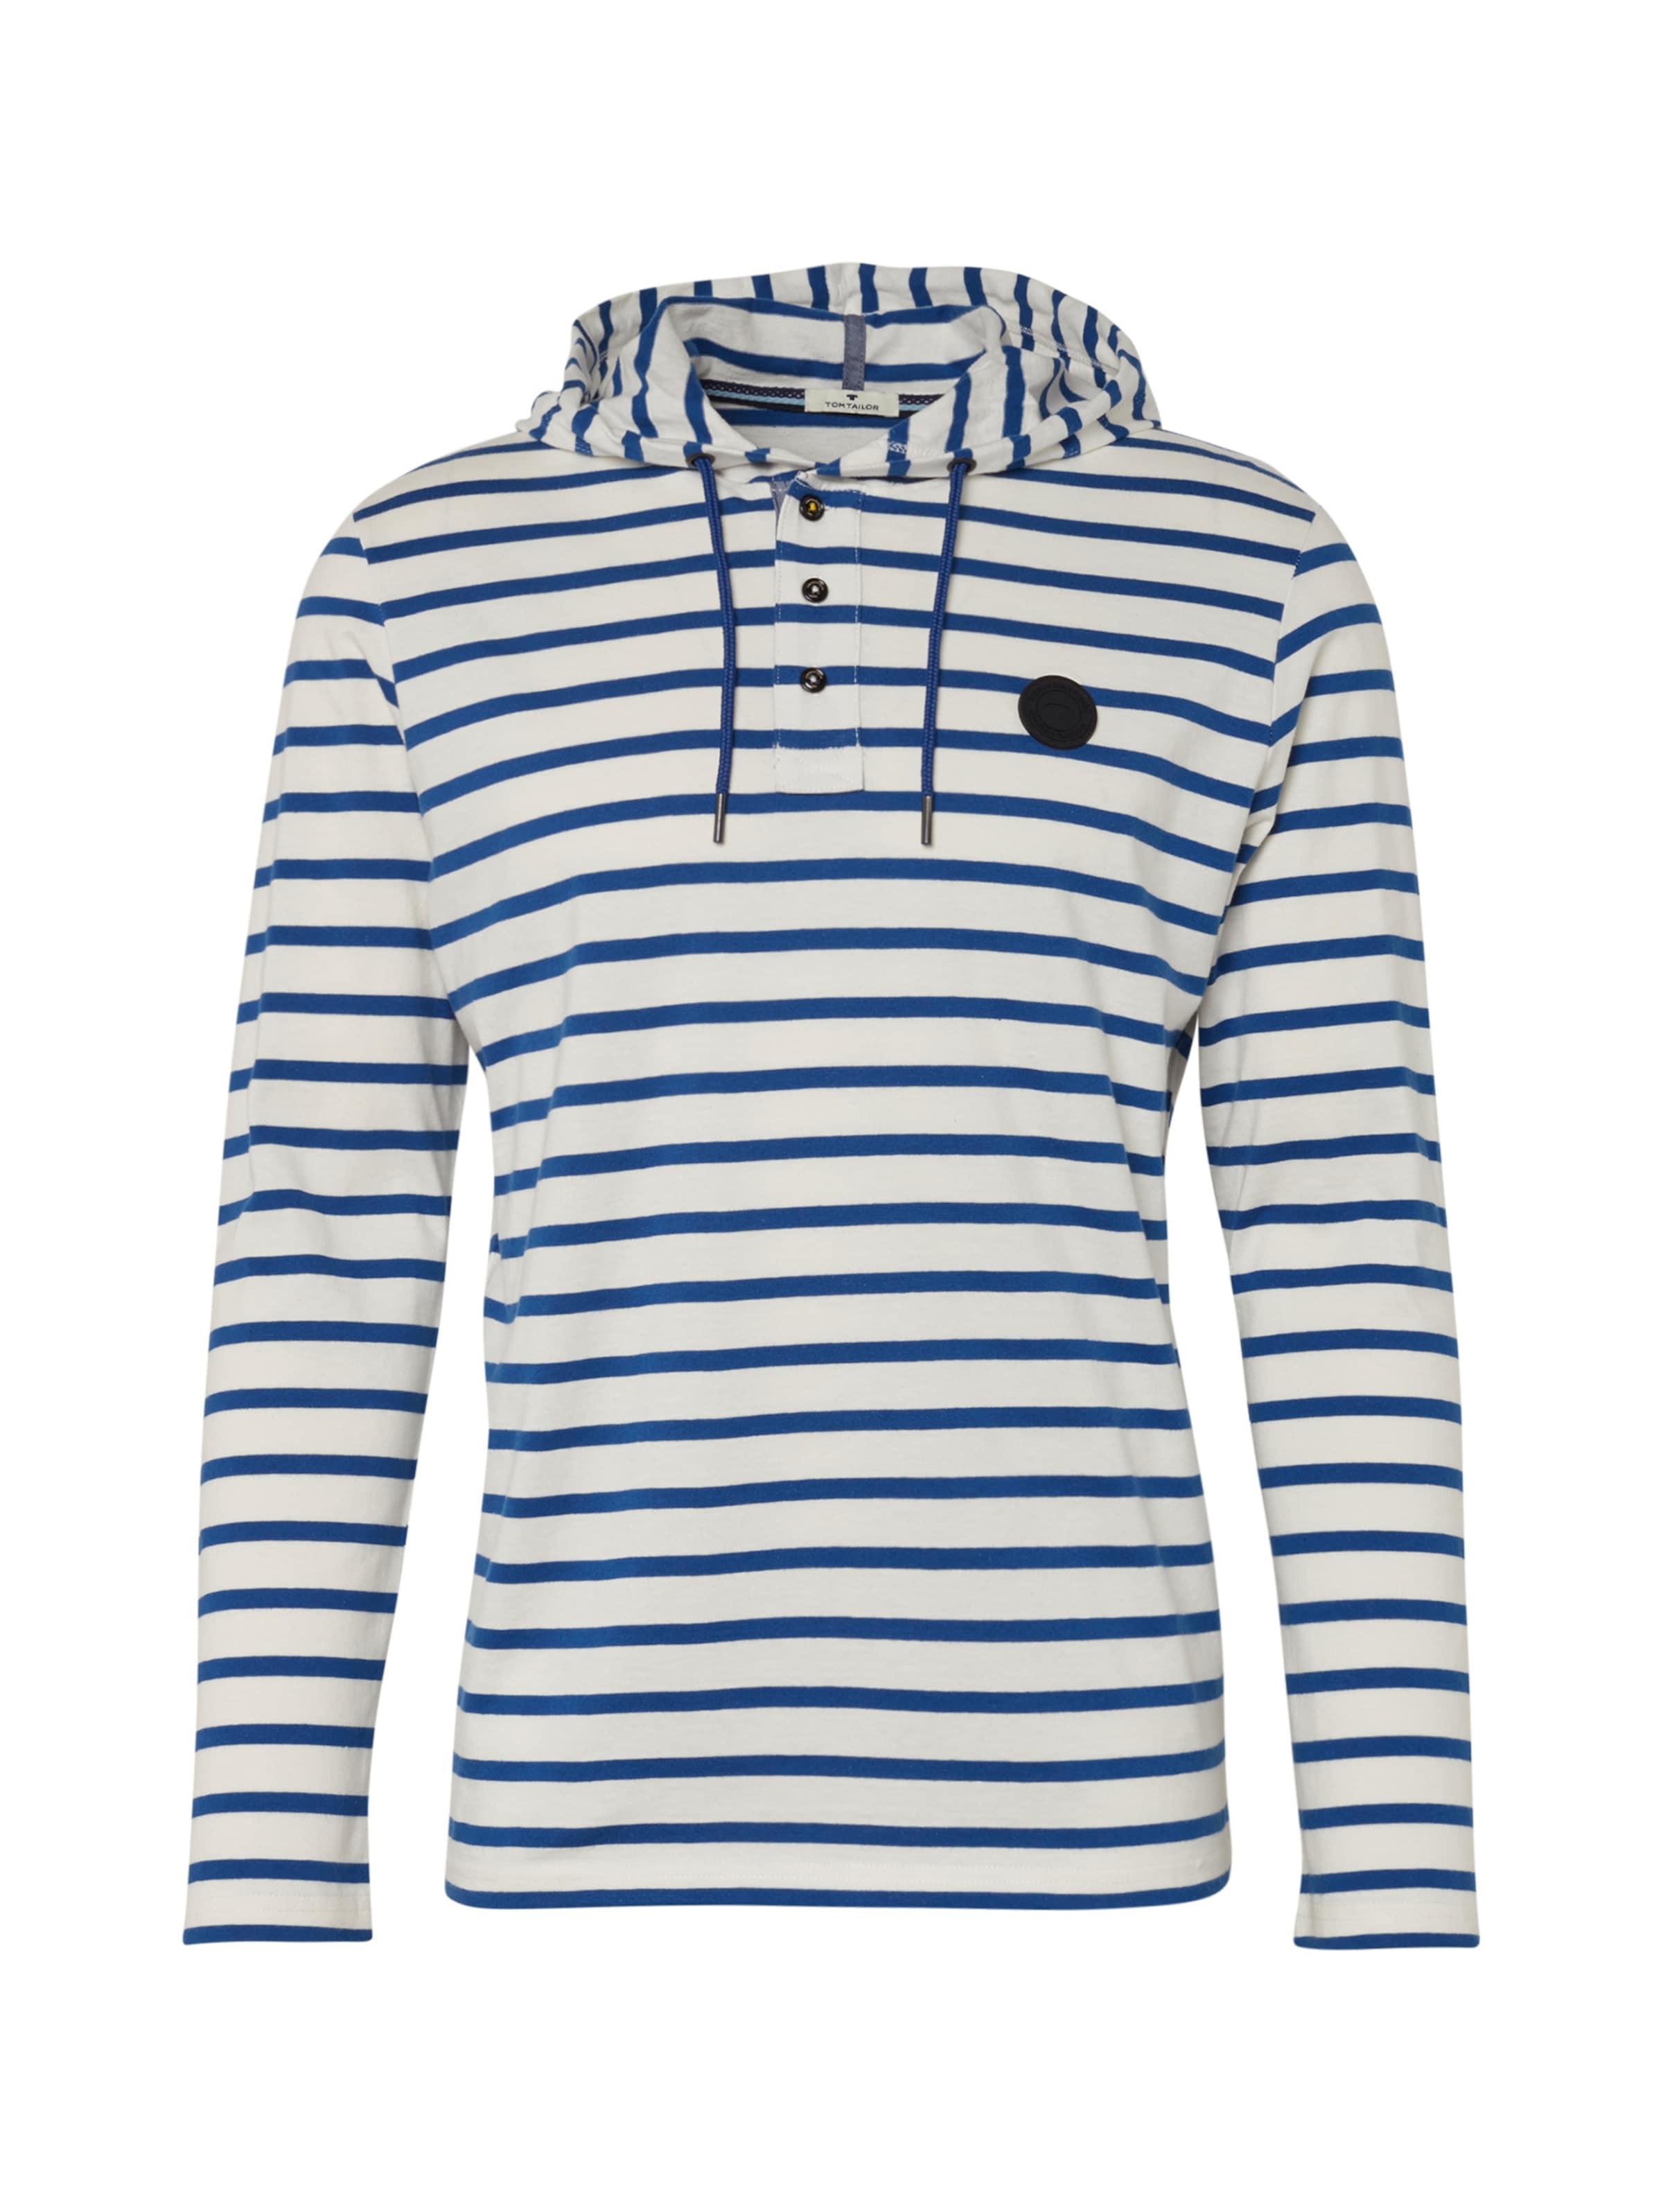 Tailor Tom shirt BlauWeiß In T BeCEWQdxor